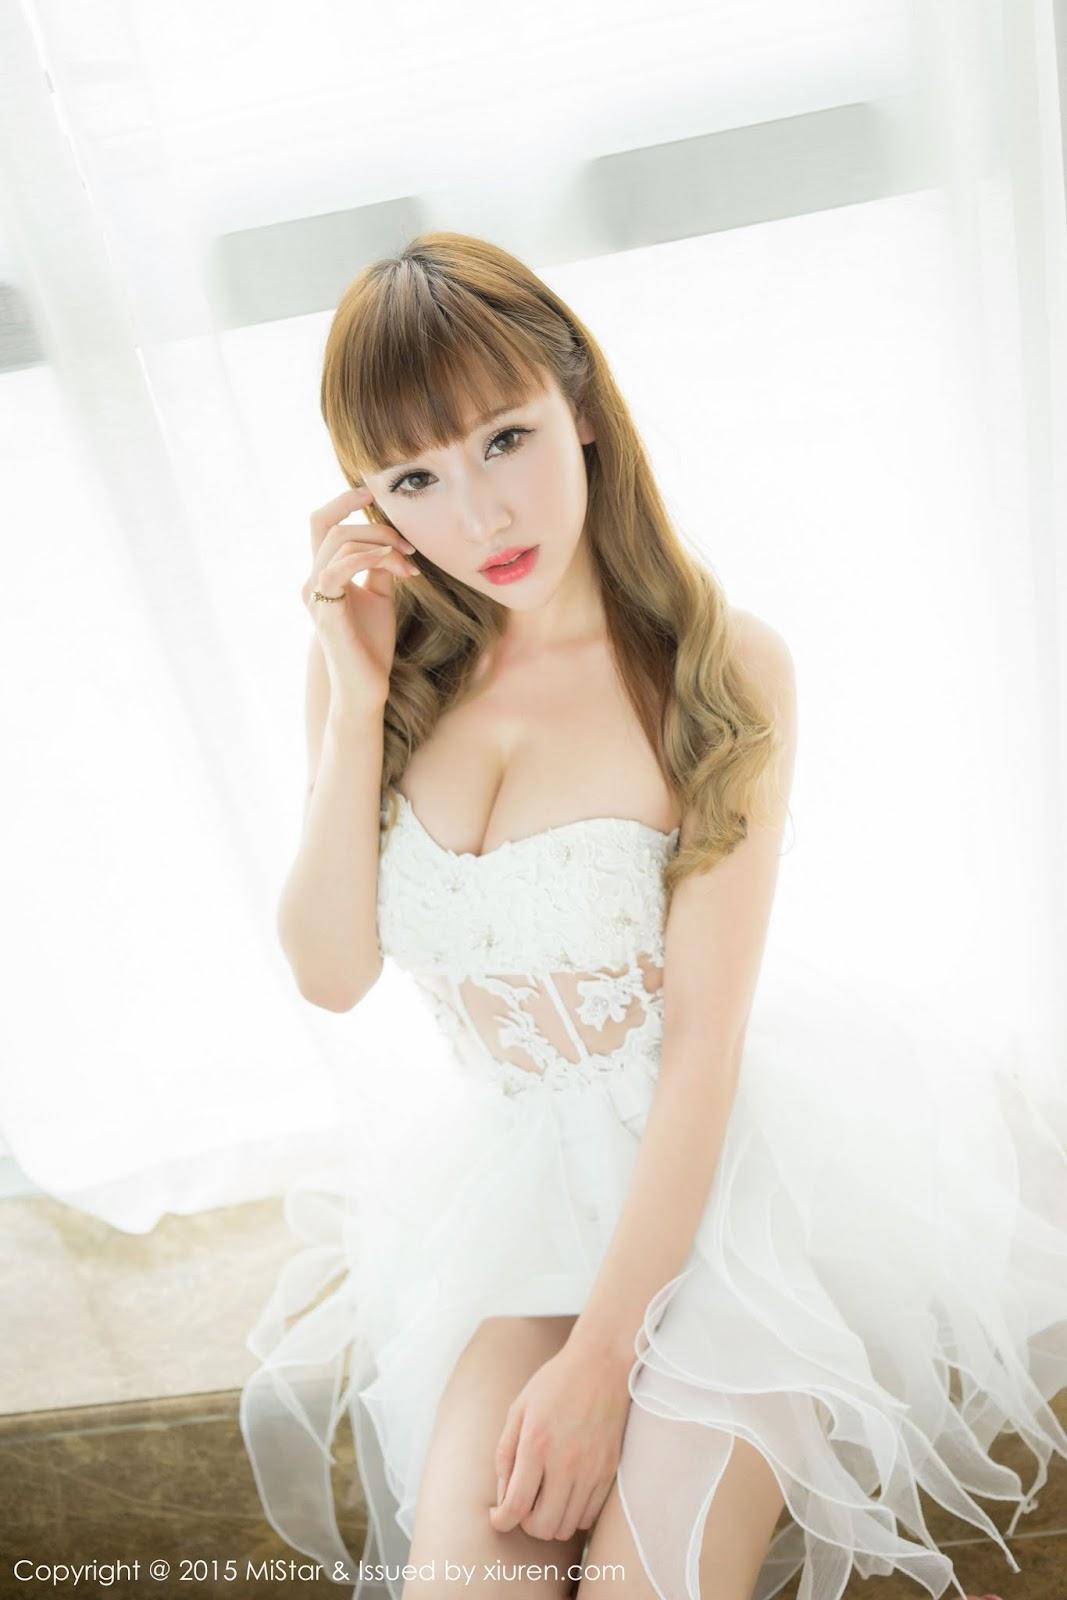 0005 - MiStar Vol.005 Model: 斯戴媛Amy